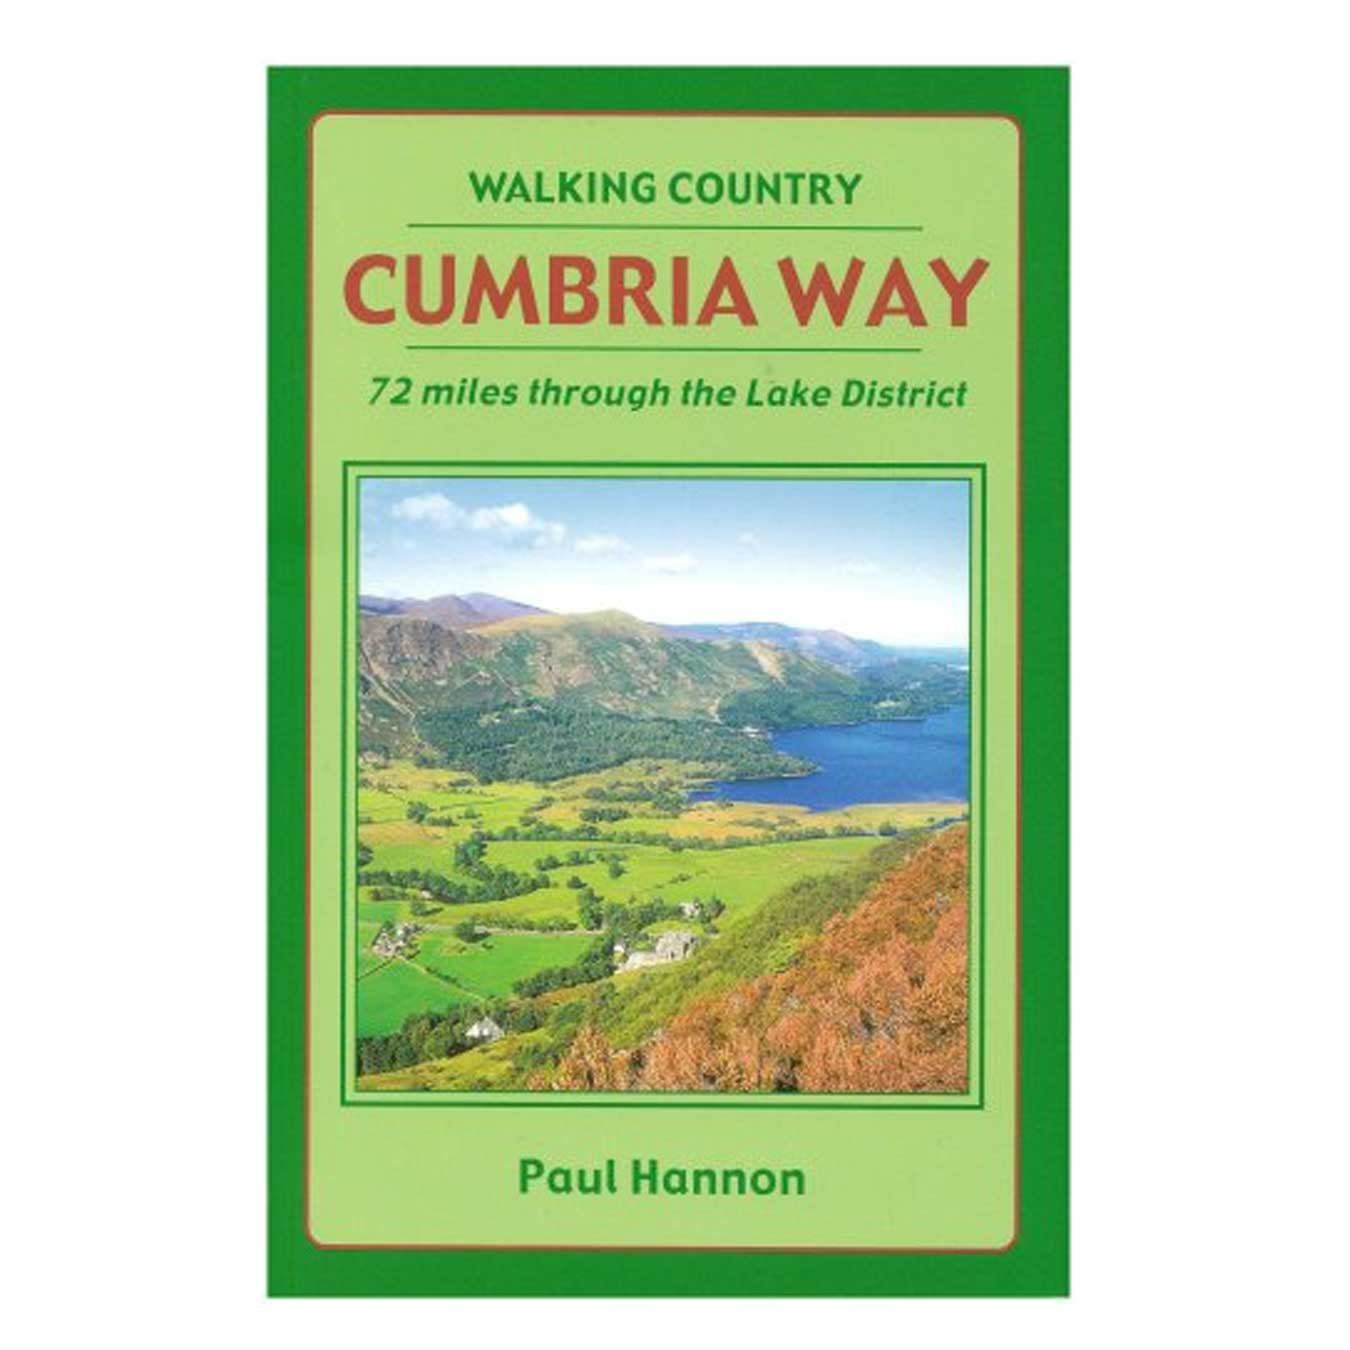 Cumbria Way: 72 Miles Through the Lake District (Walking Country